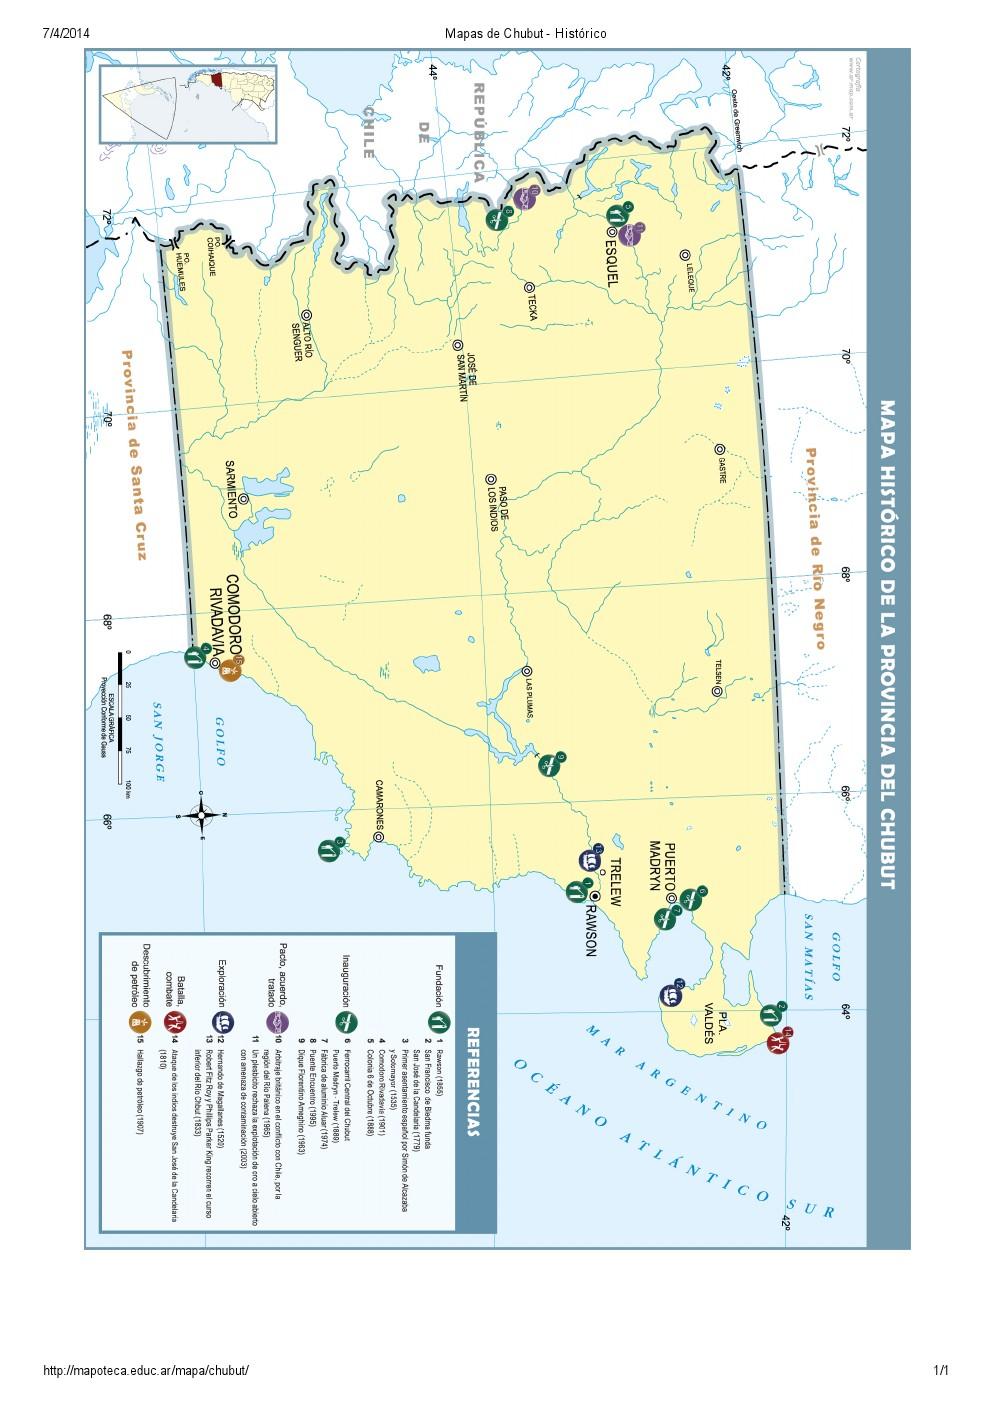 Mapa histórico del Chubut. Mapoteca de Educ.ar